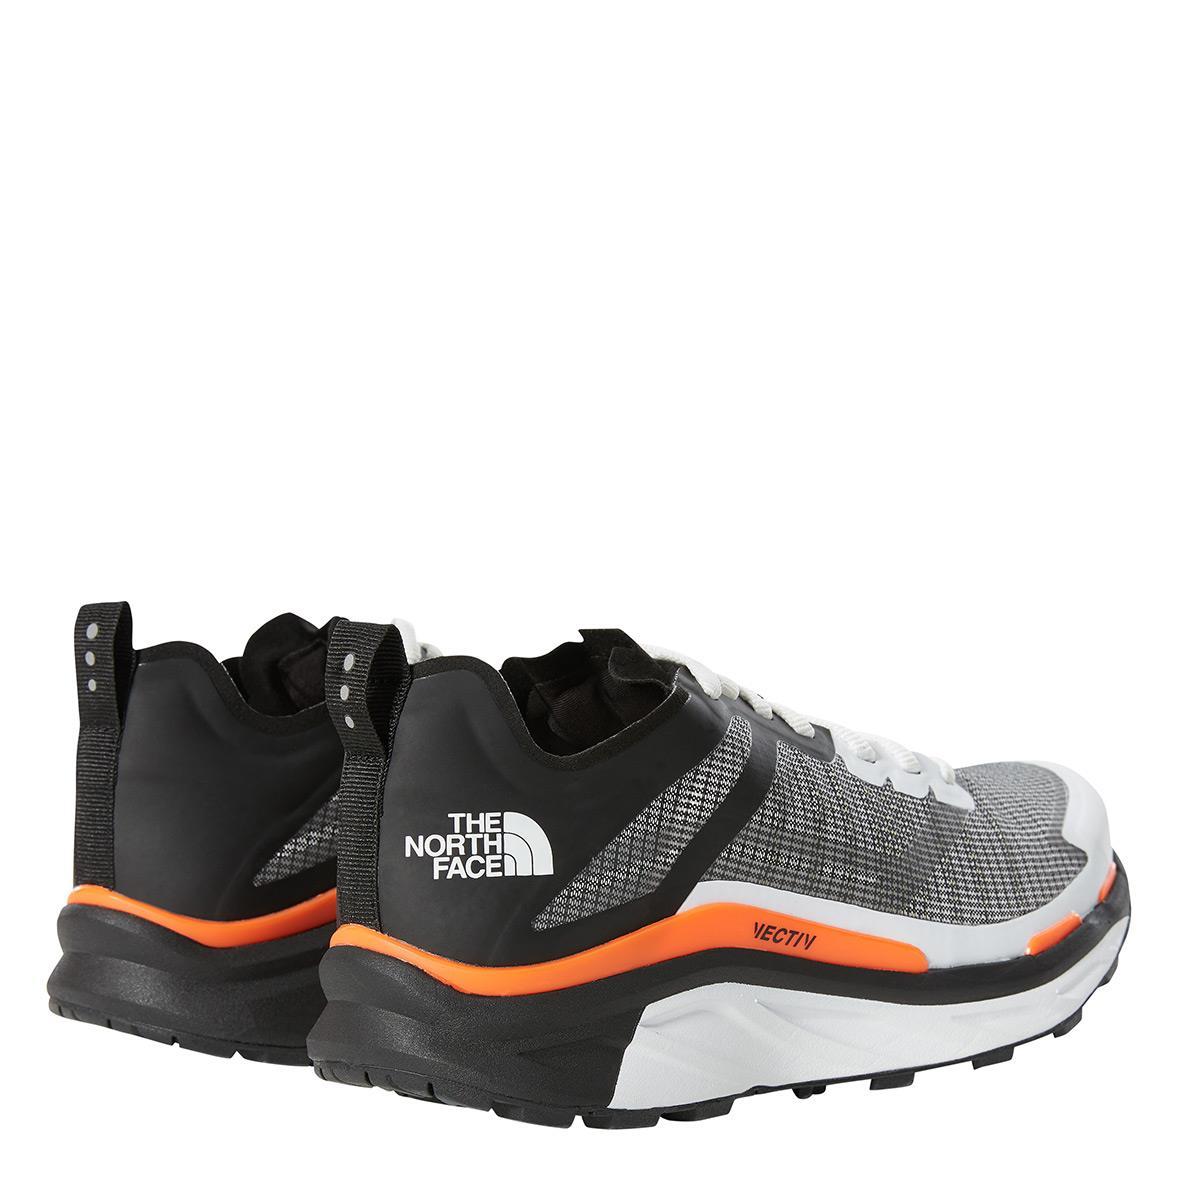 The North Face W VECTIV INFINITE Kadın Ayakkabısı NF0A4T3OLA91